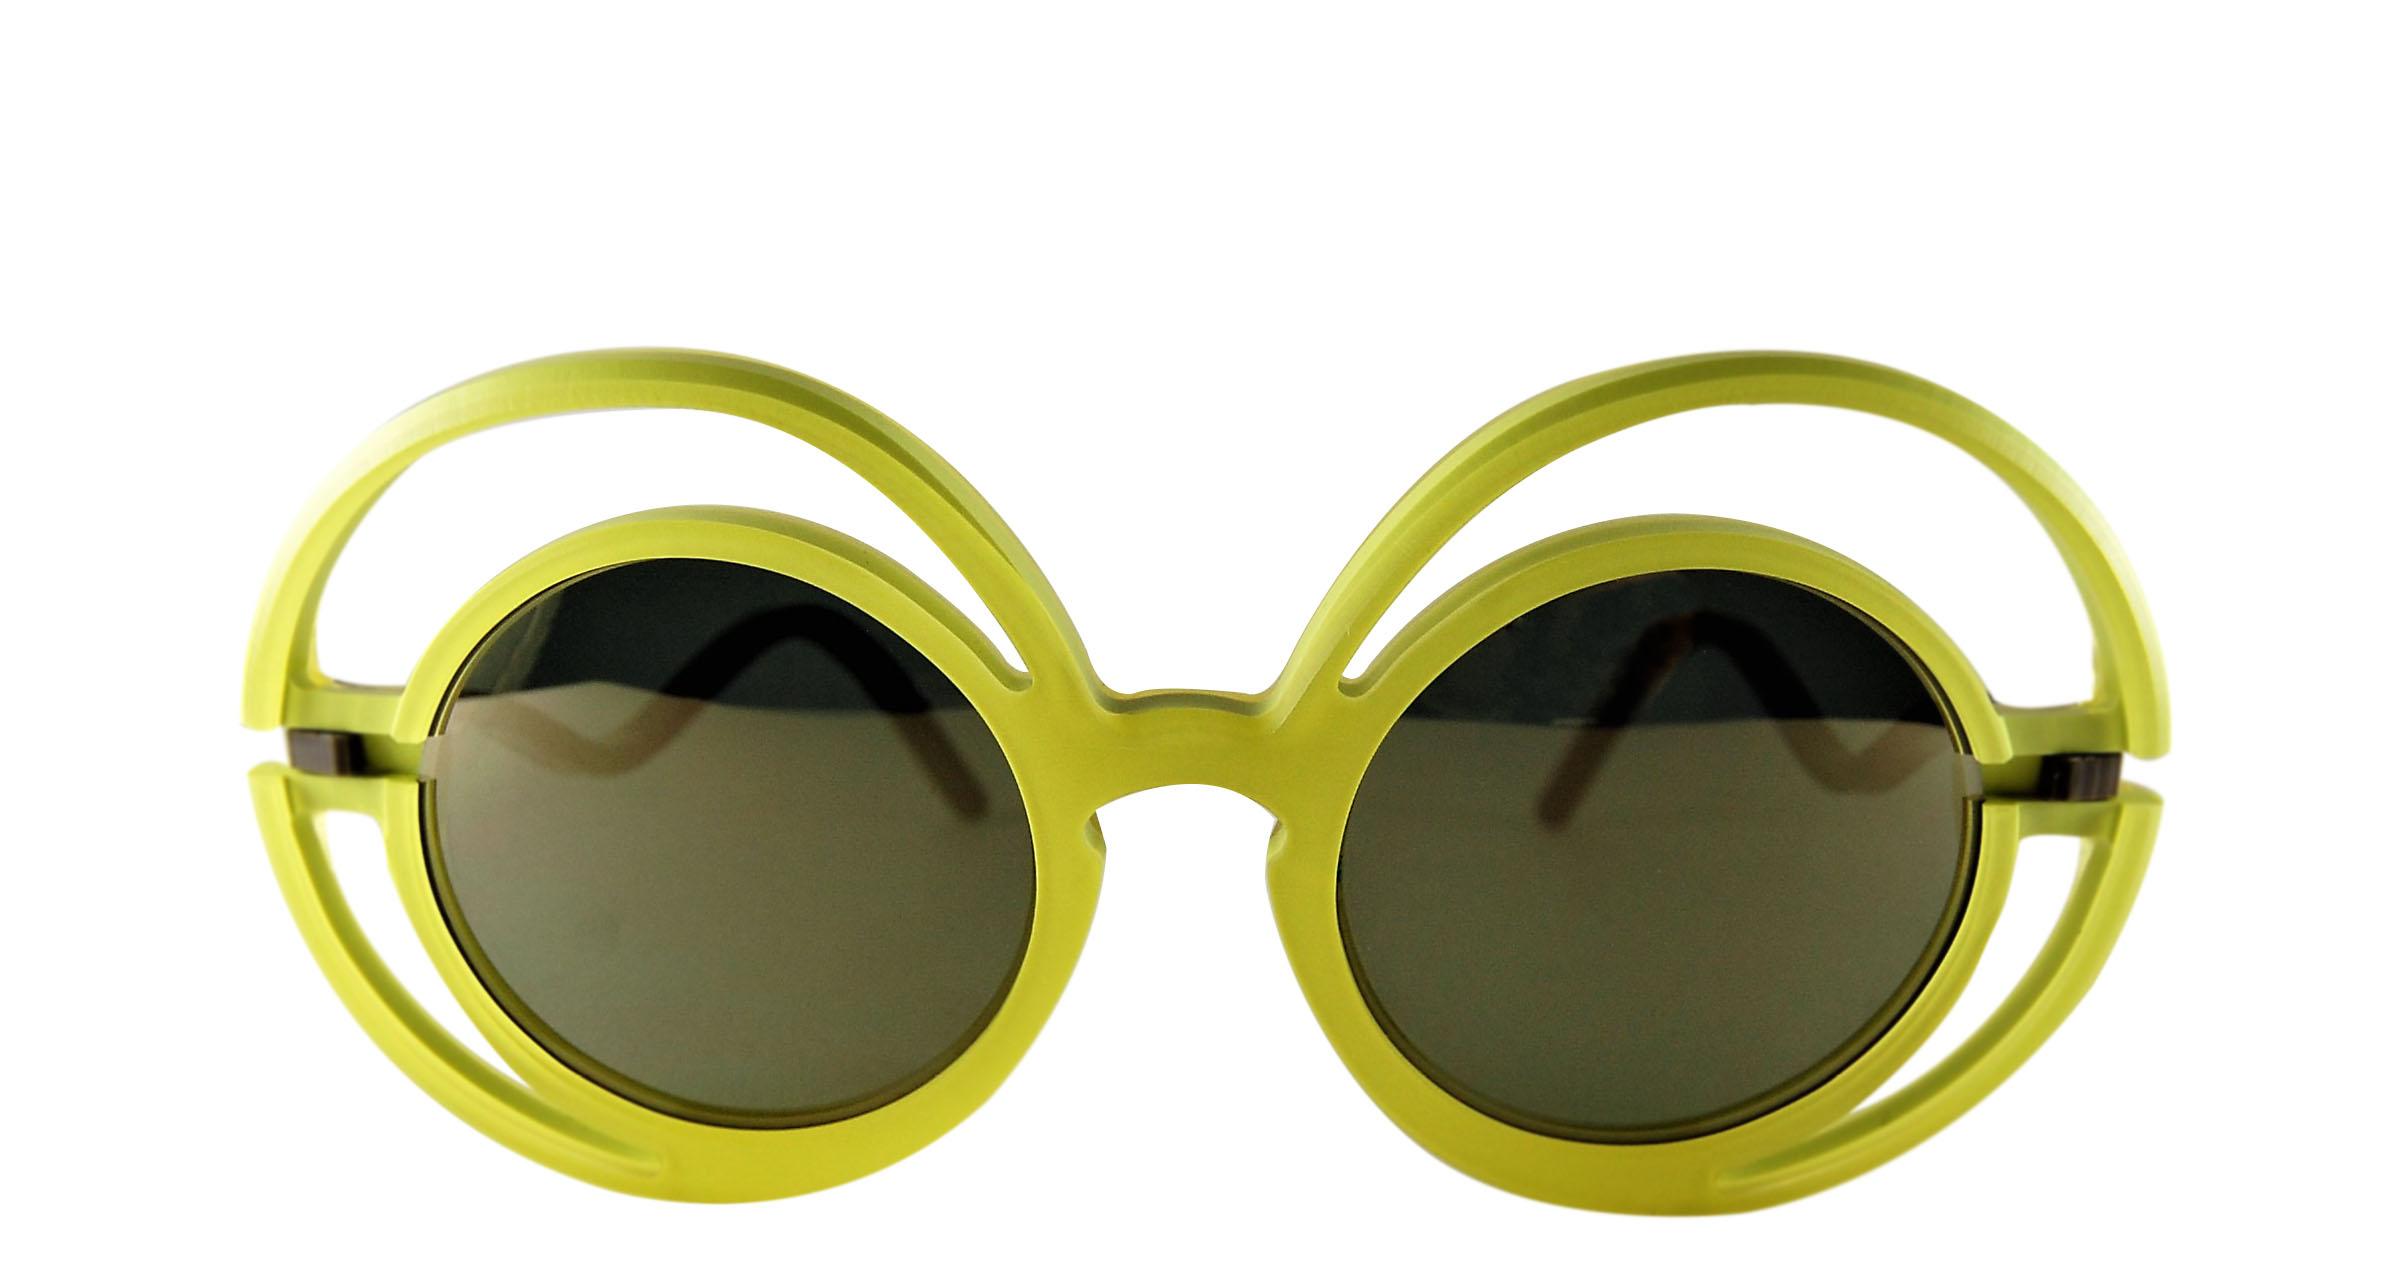 Occhiale da sole plastic de lux mod. Chantal-yellow